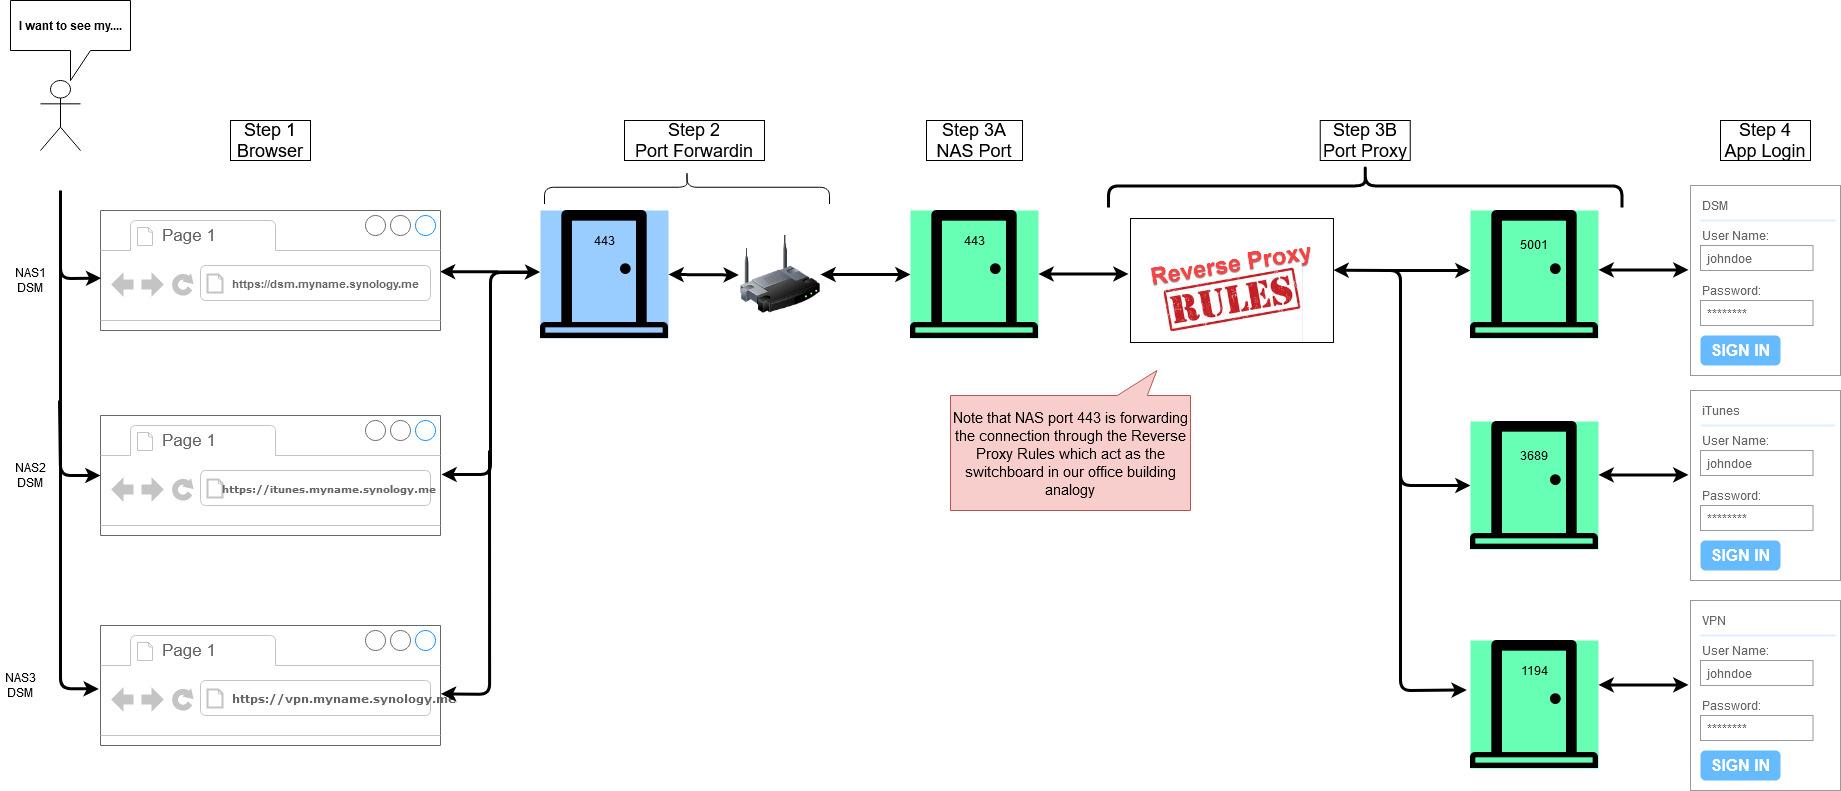 Reverse Proxy Flowchart.jpg